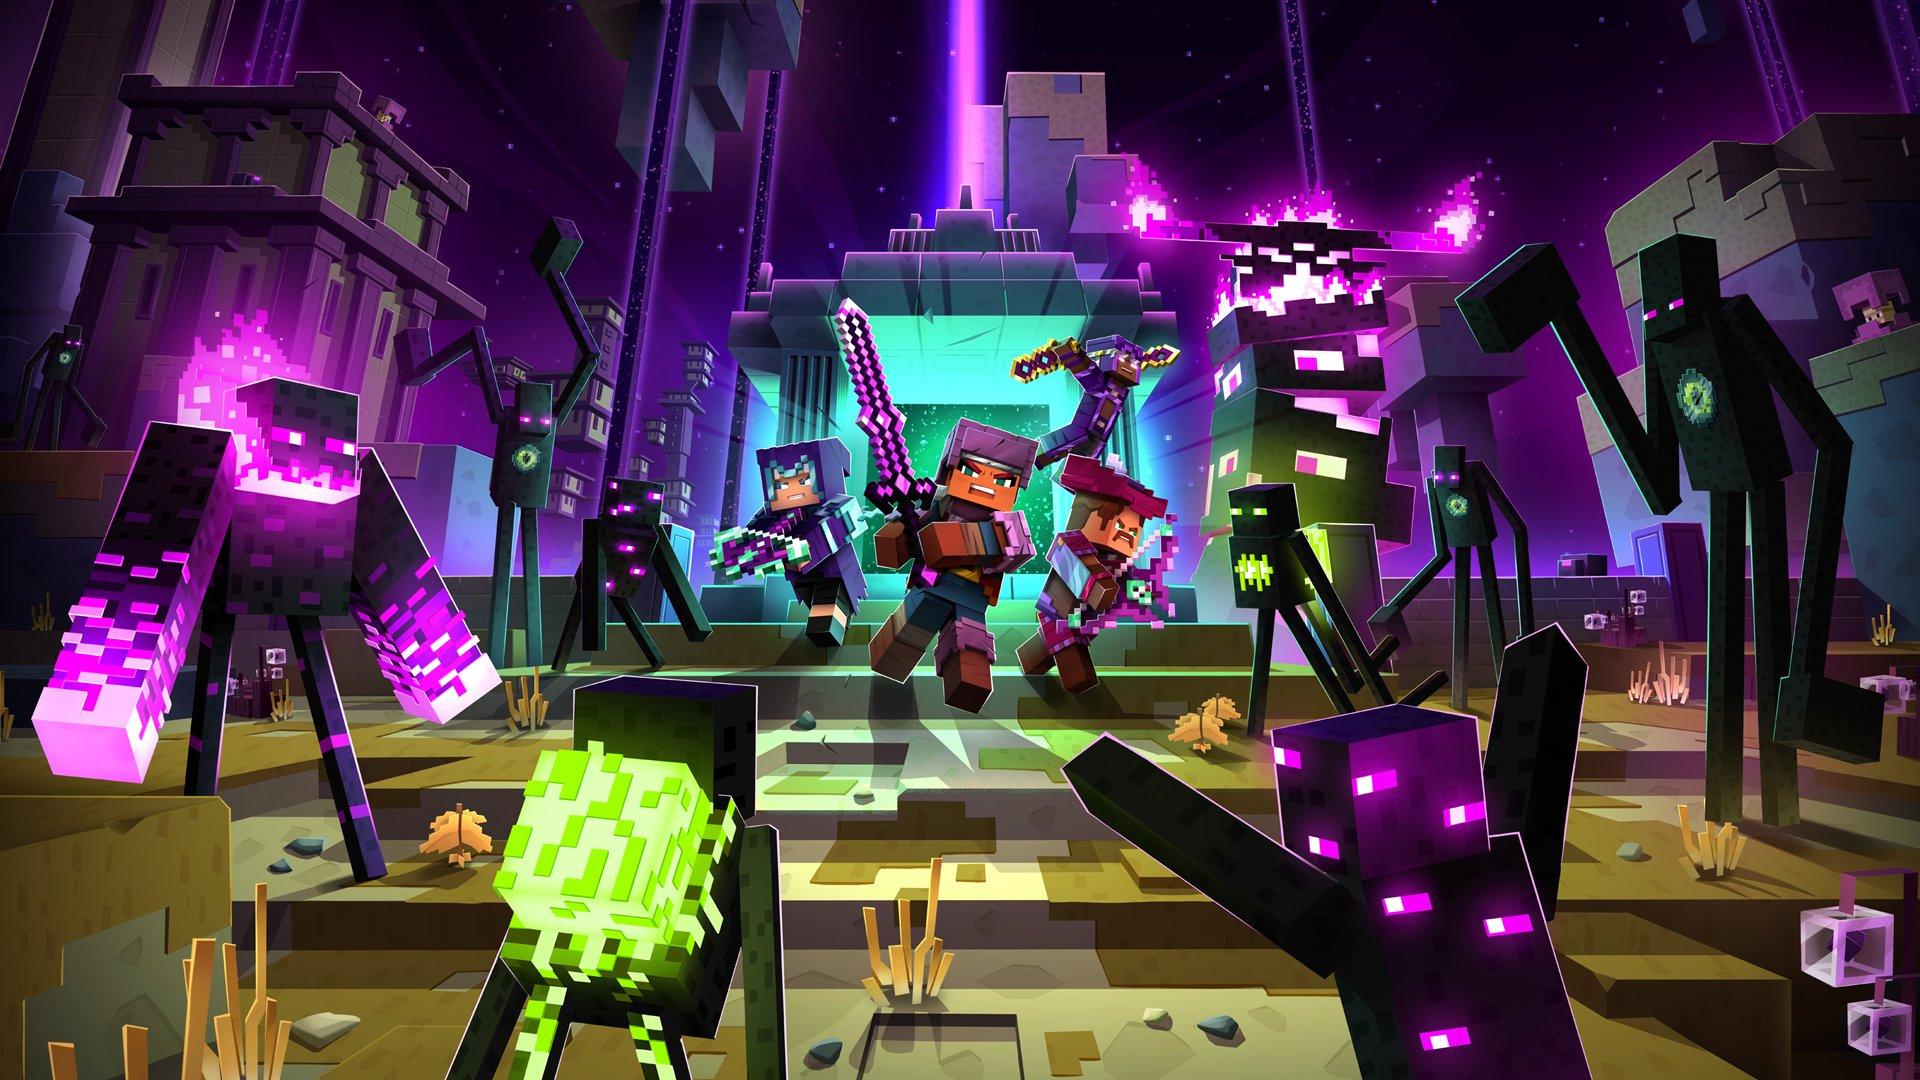 Minecraft Dungeons добралась и до Steam - спустя 1,5 года после релиза